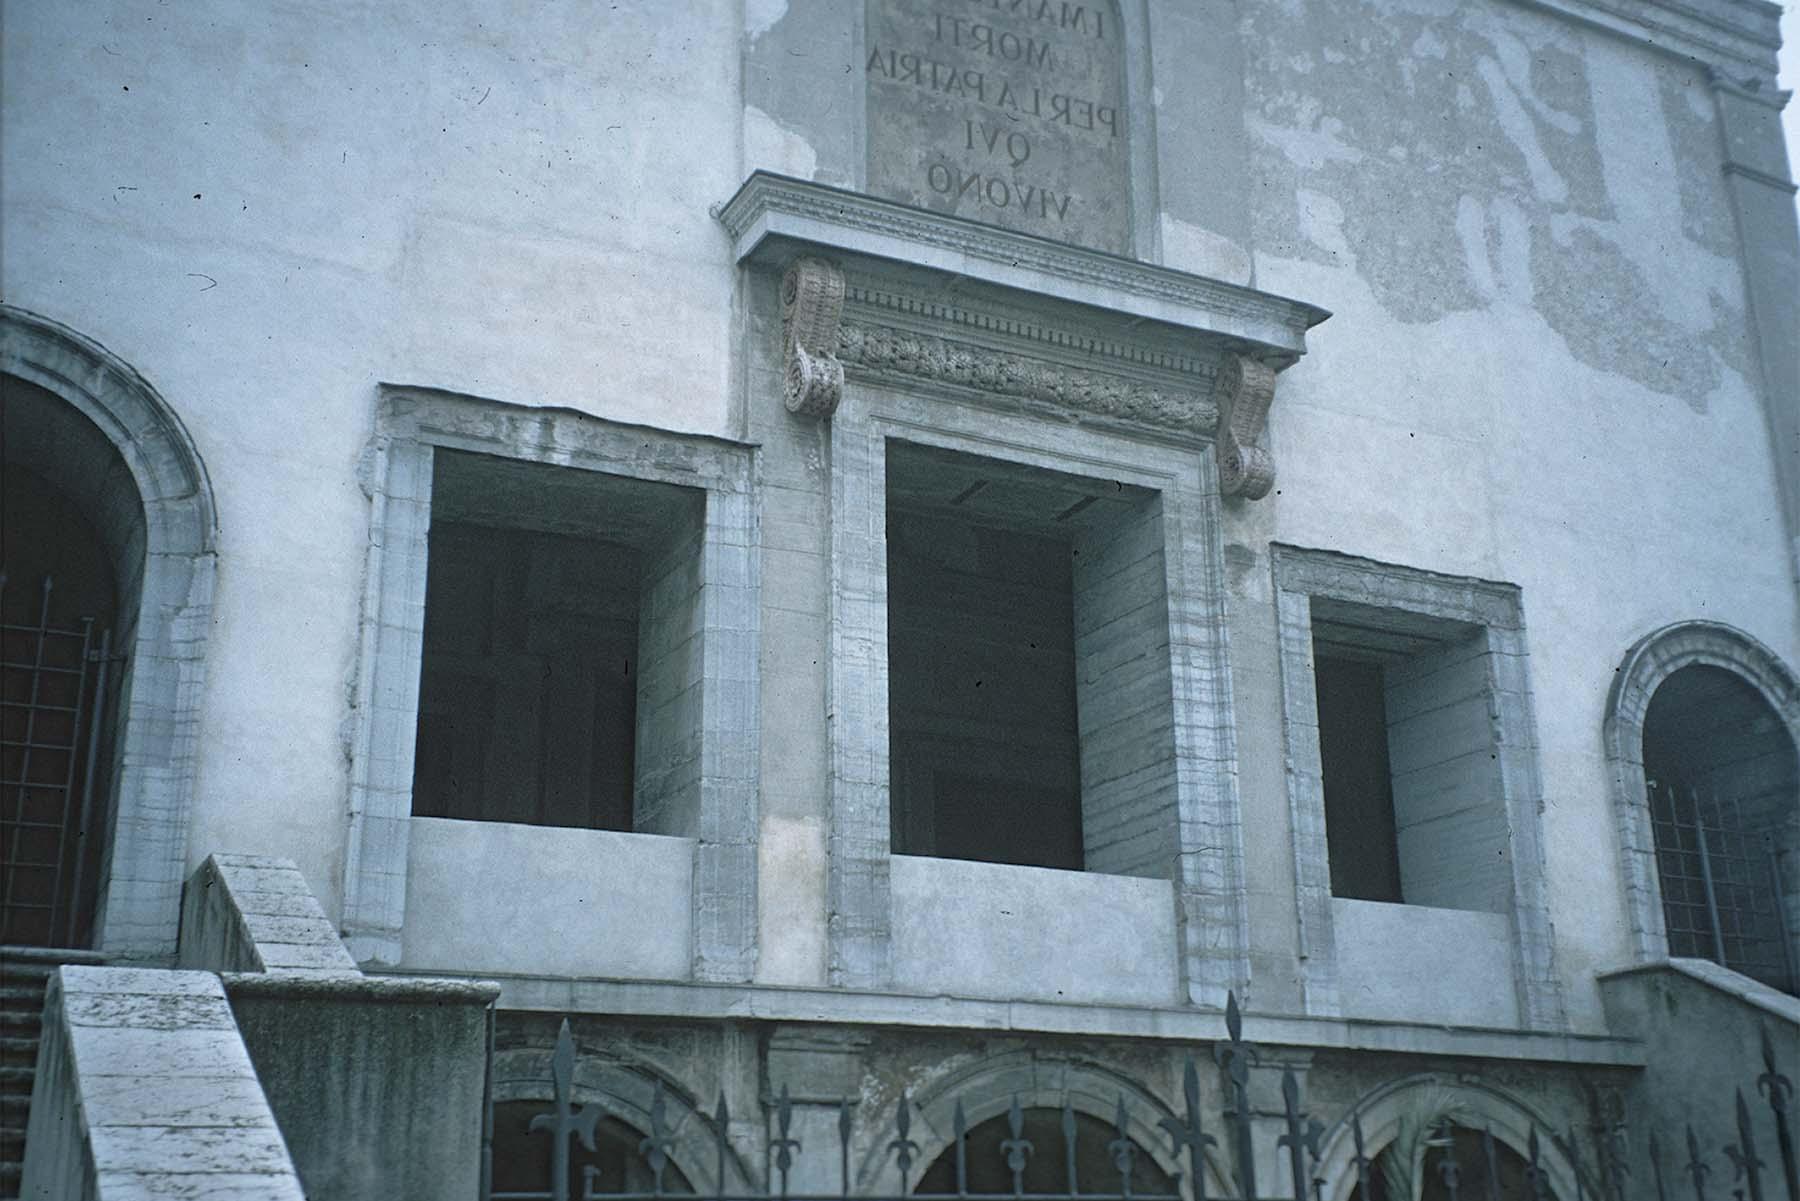 Arche-Restauri_Parma_1994_Plutei-Calchi-01